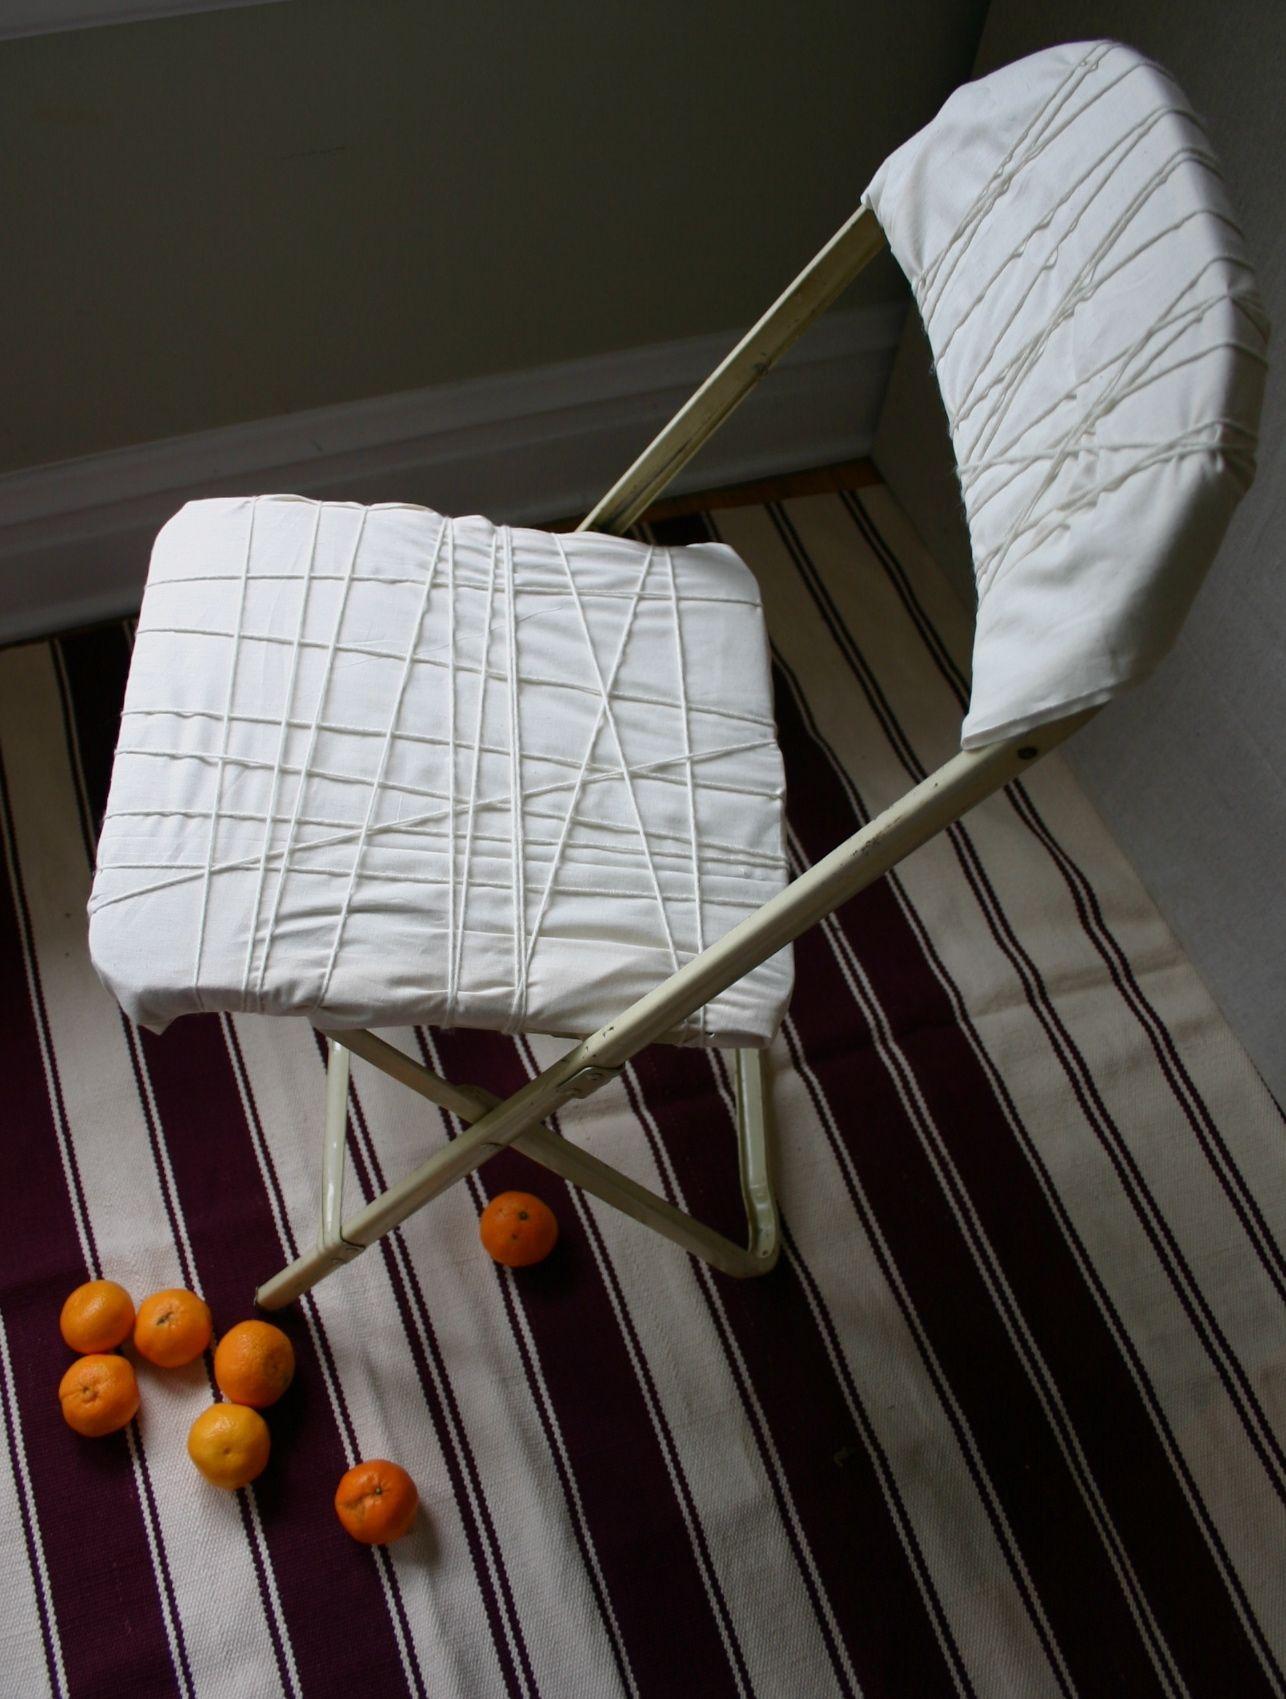 Metal Folding Chair Covers Diy Diy Chair Covers Folding Chair